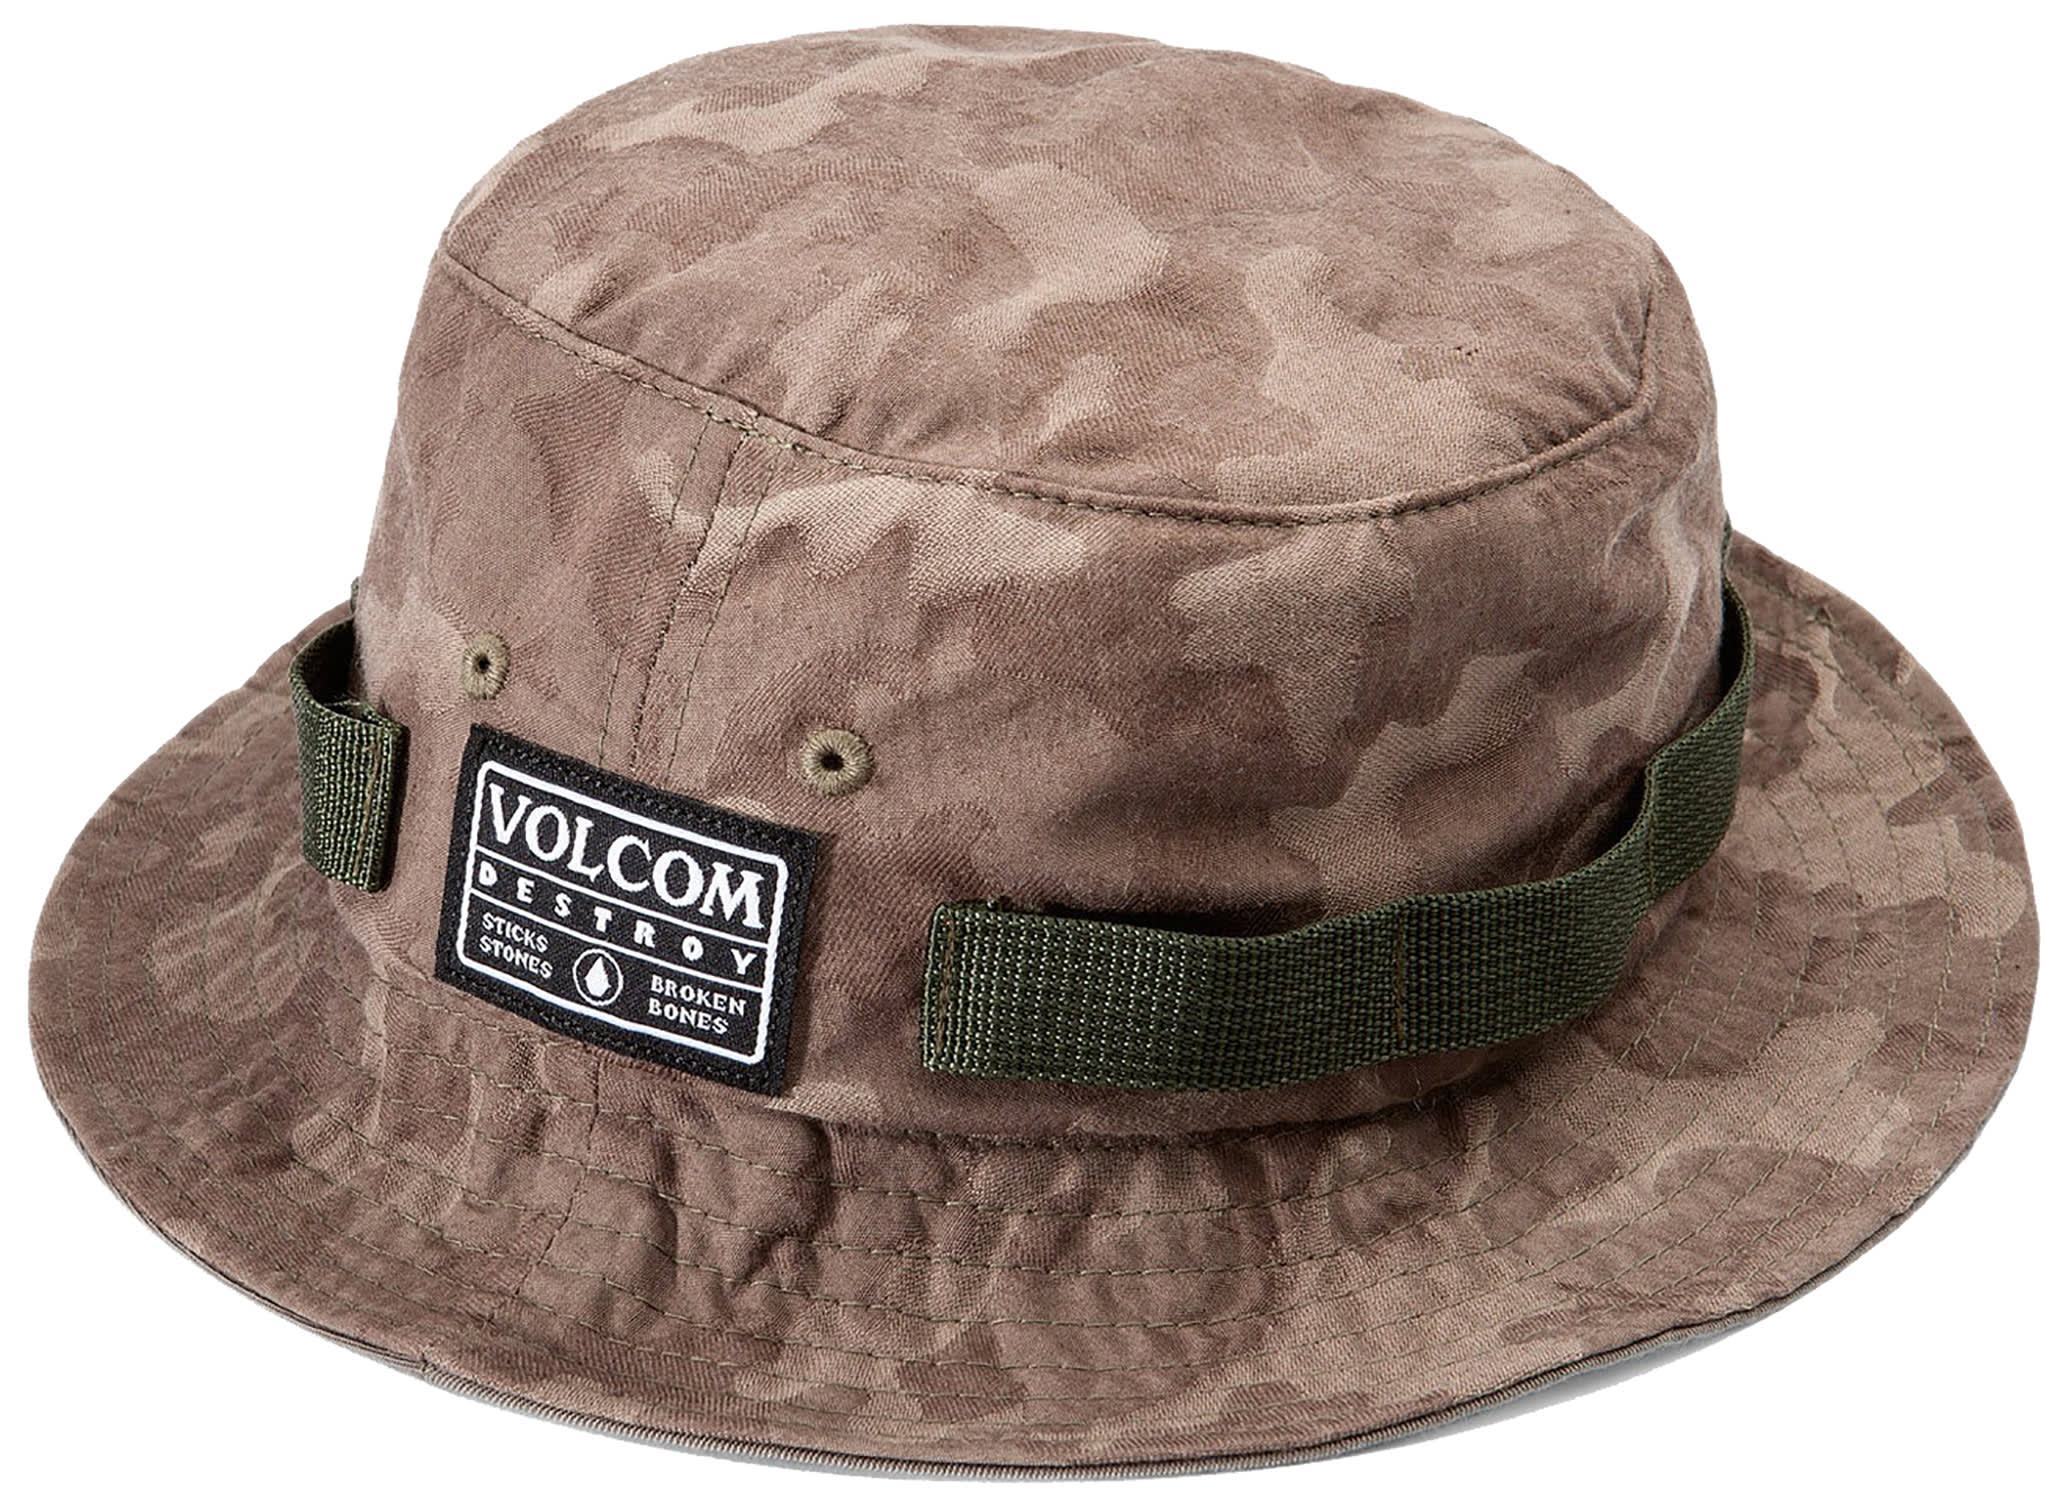 a2d38500b7c ... usa volcom brodie bucket hat thumbnail 1 b5344 69ece